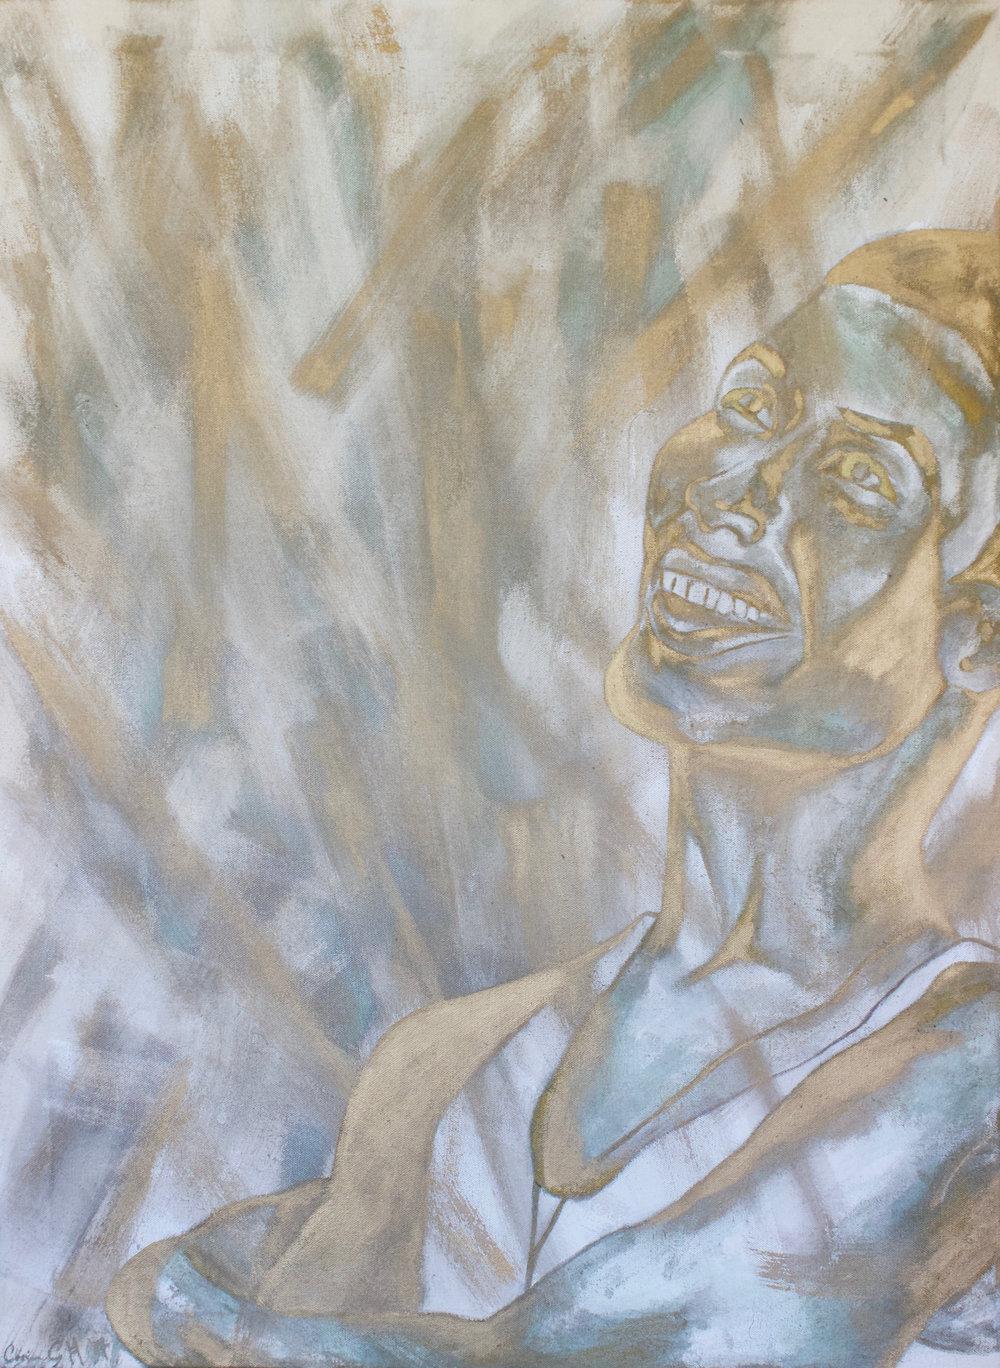 AARON M - PORTRAIT OF AARON MORRIS BY CORINNE HOLLOWAY